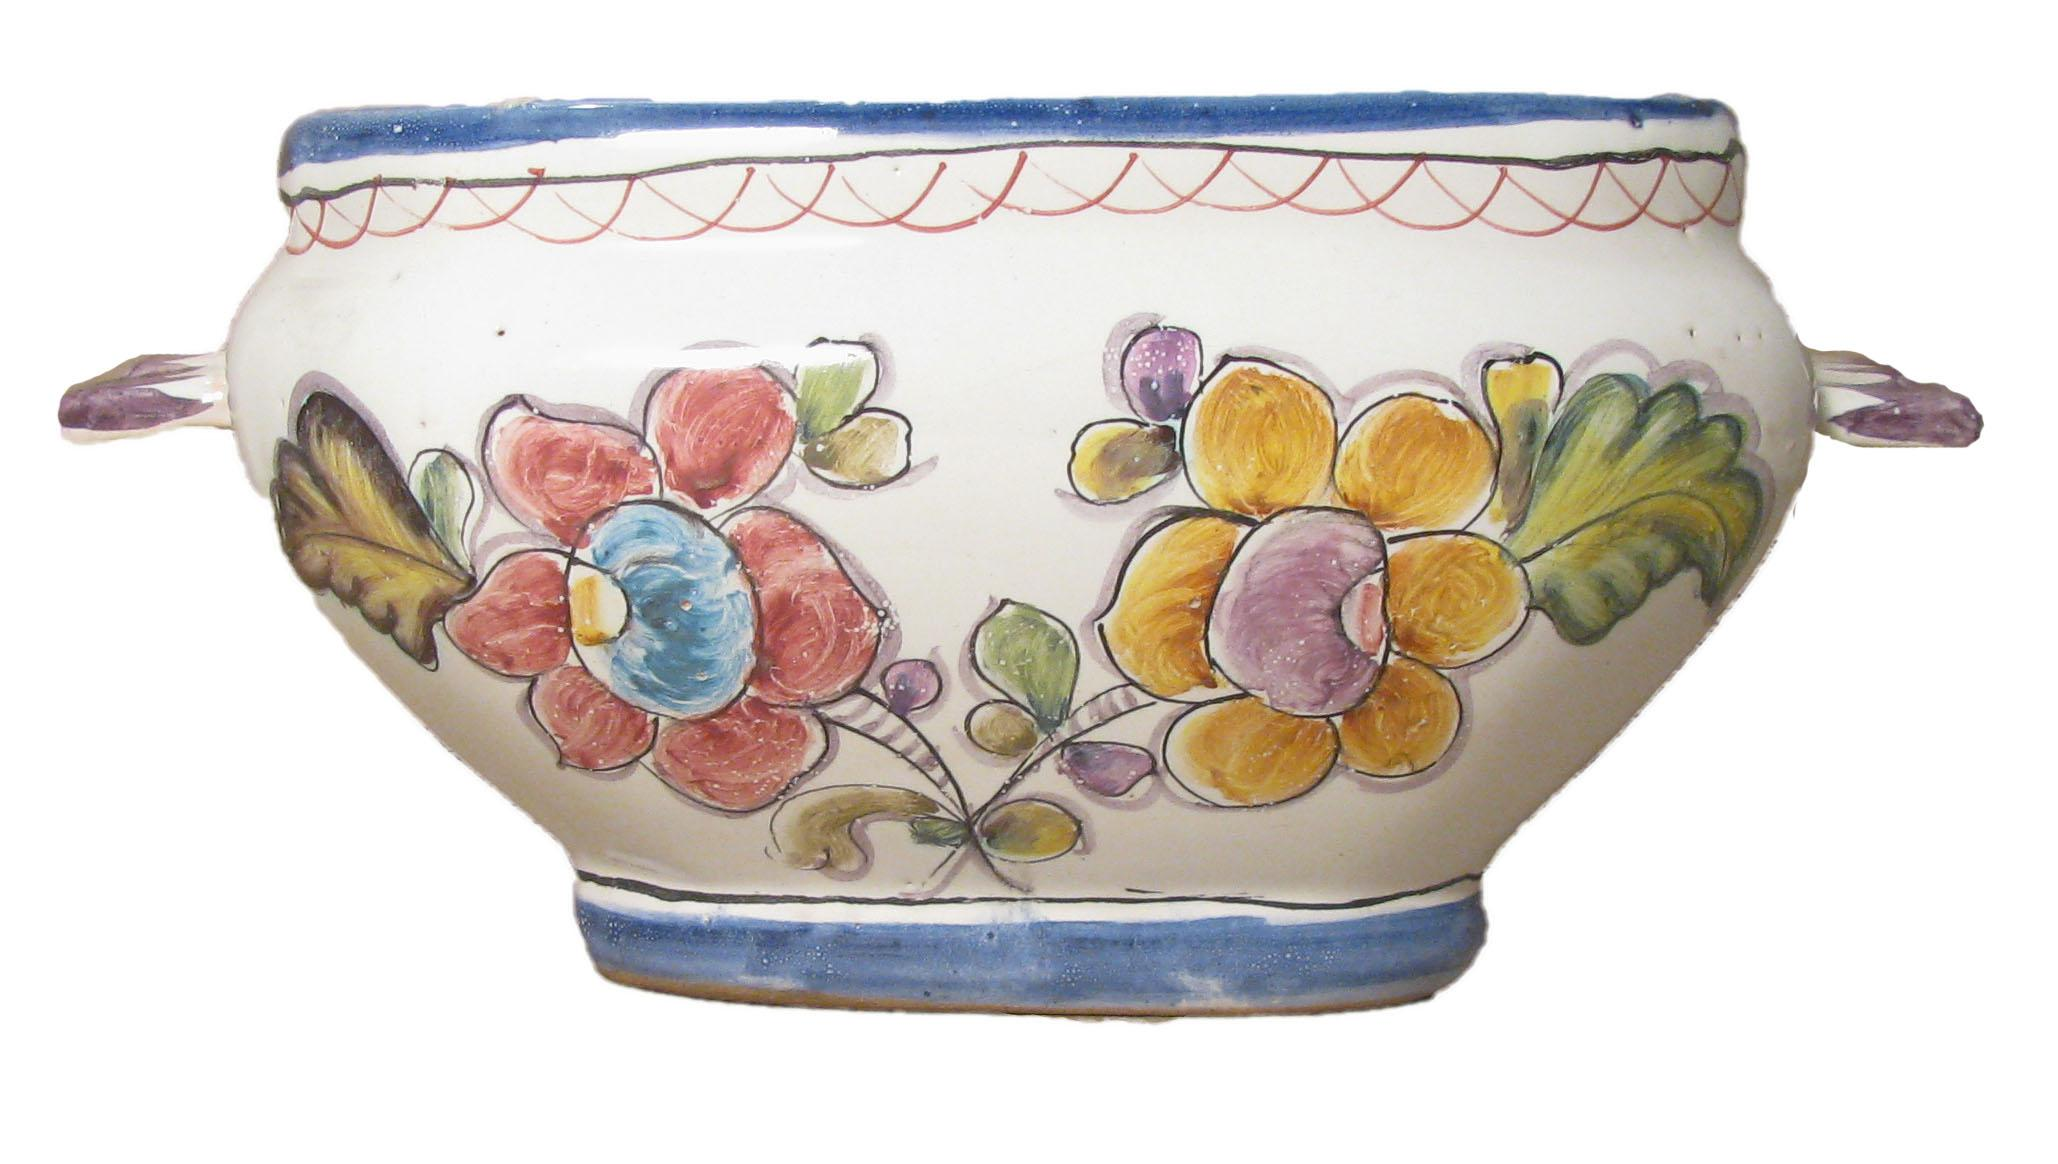 Vintage Portuguese Coimbra Pottery Tureen - Image 3 of 4  sc 1 st  Chairish & Vintage Portuguese Coimbra Pottery Tureen | Chairish